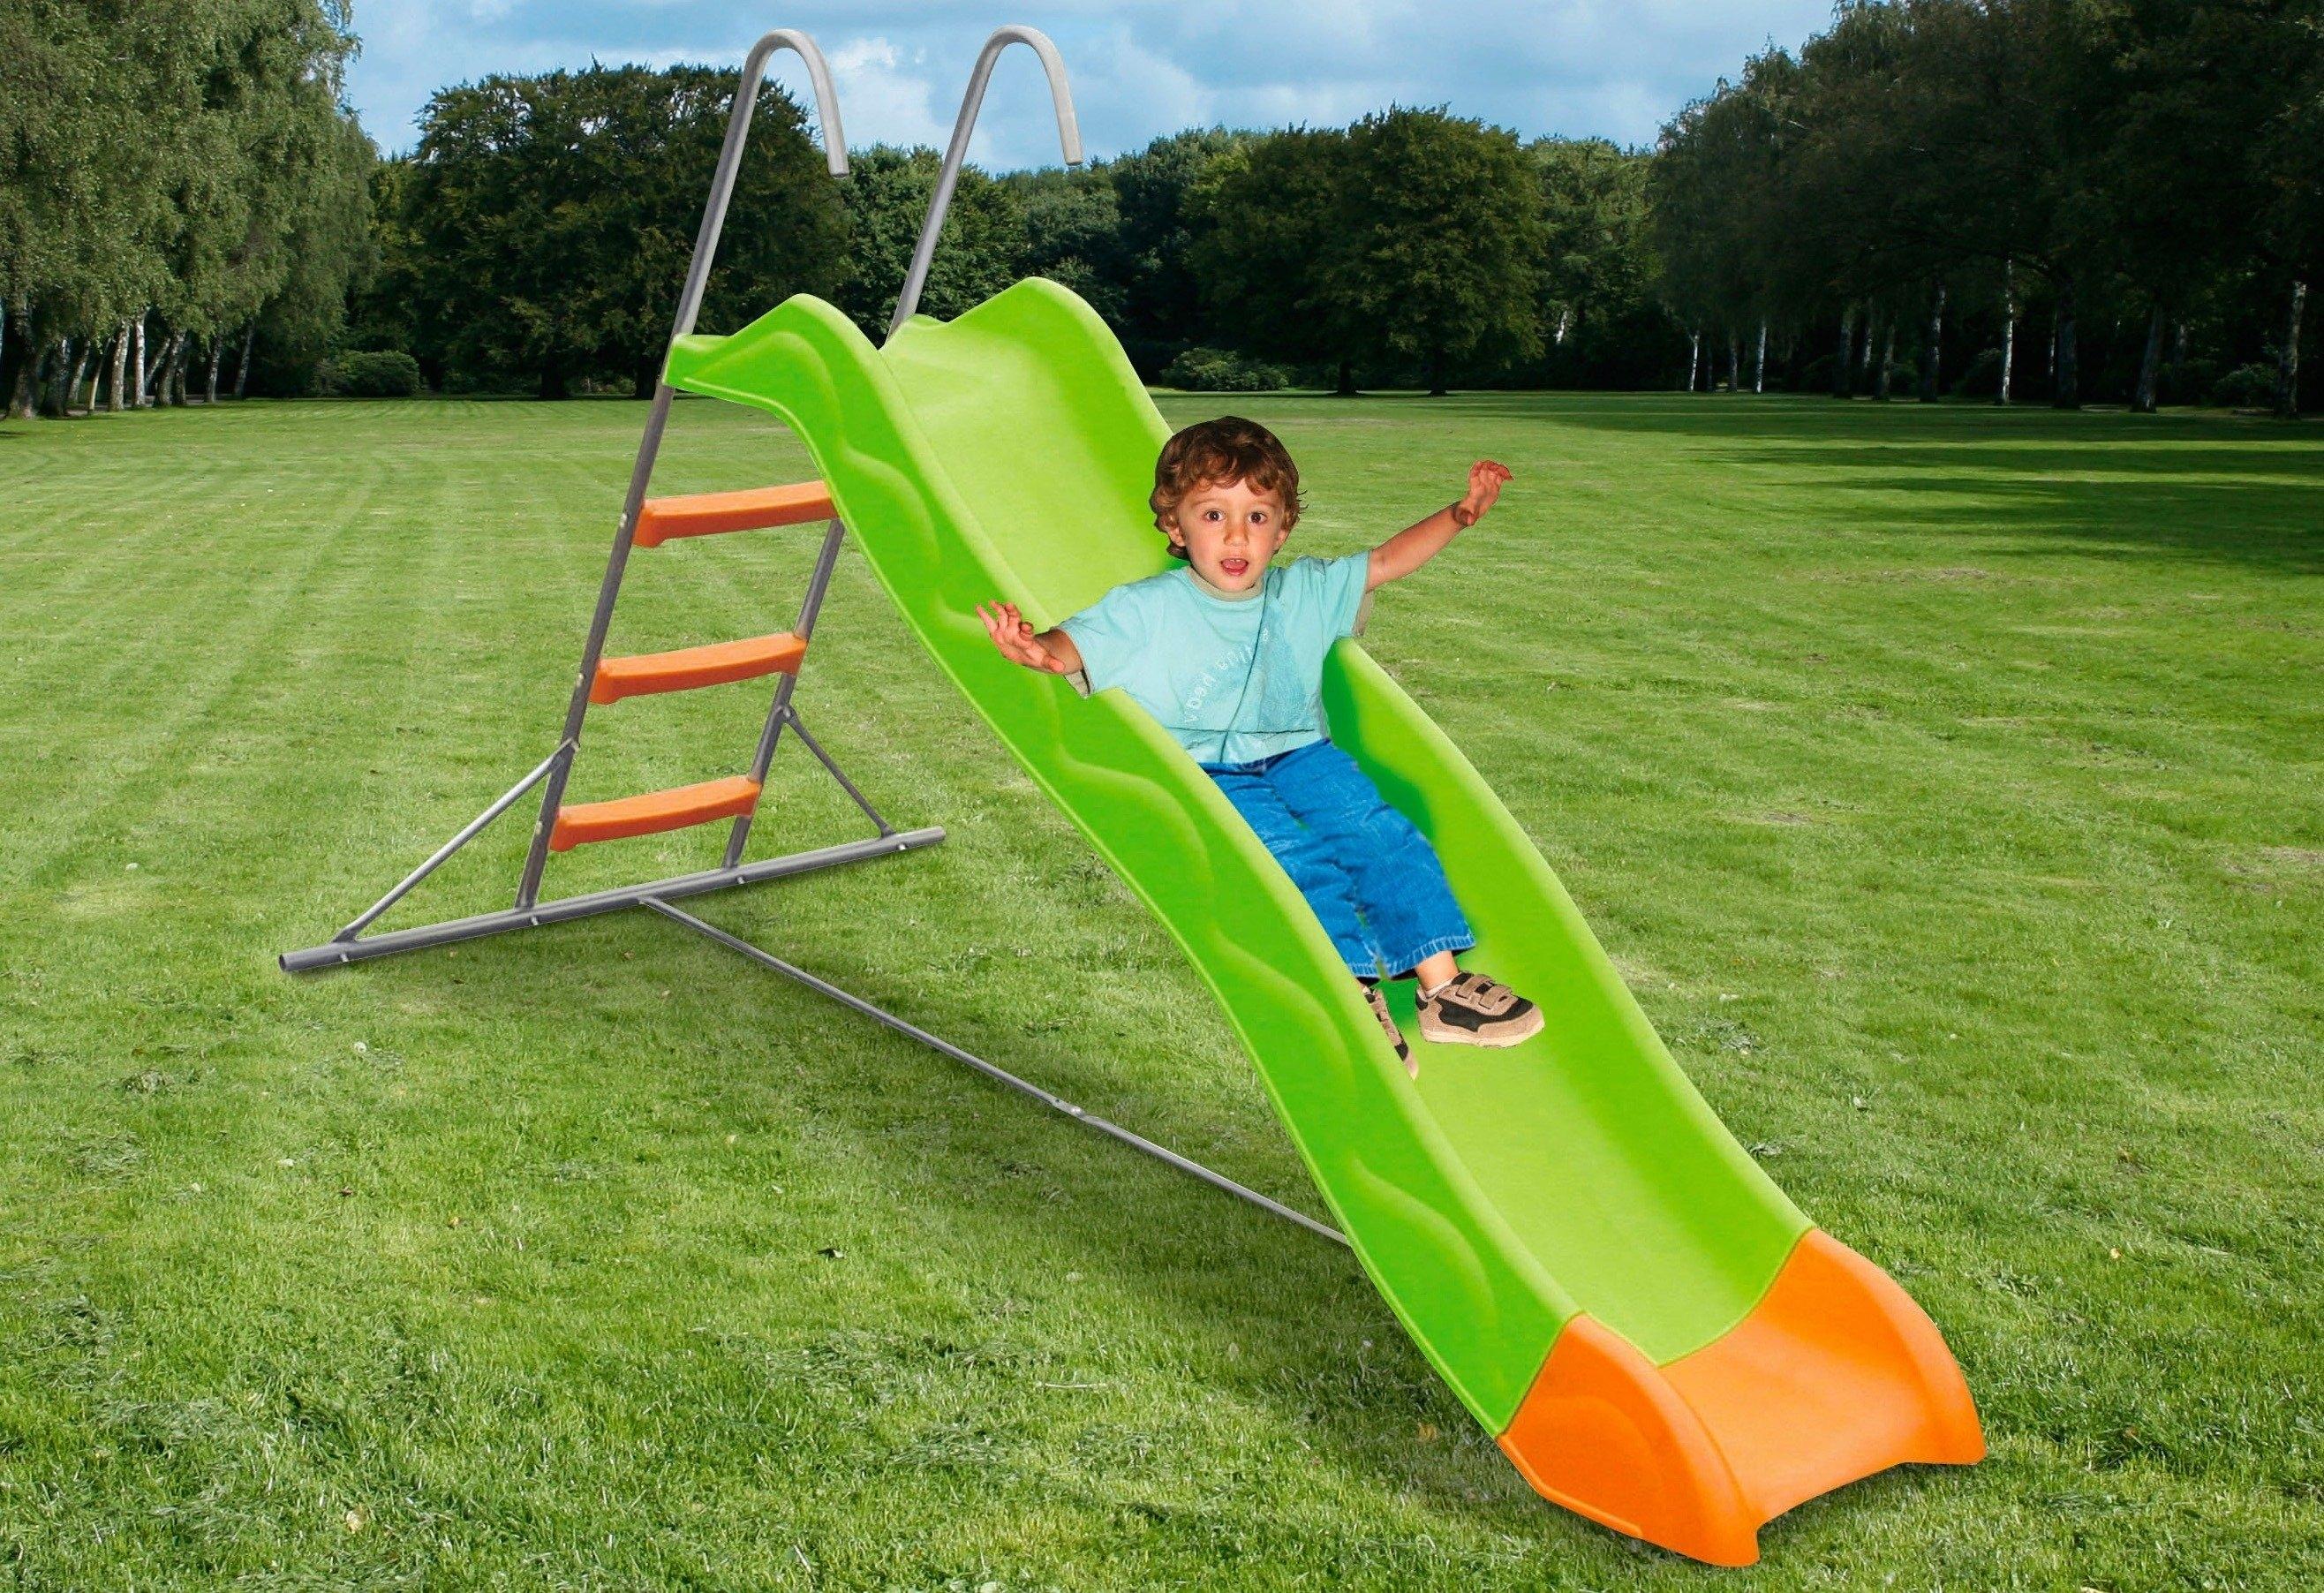 Yardmaster Glijbaan »Slides X-Stream XS215«, Lxbxh: 248x120x144 cm - gratis ruilen op otto.nl